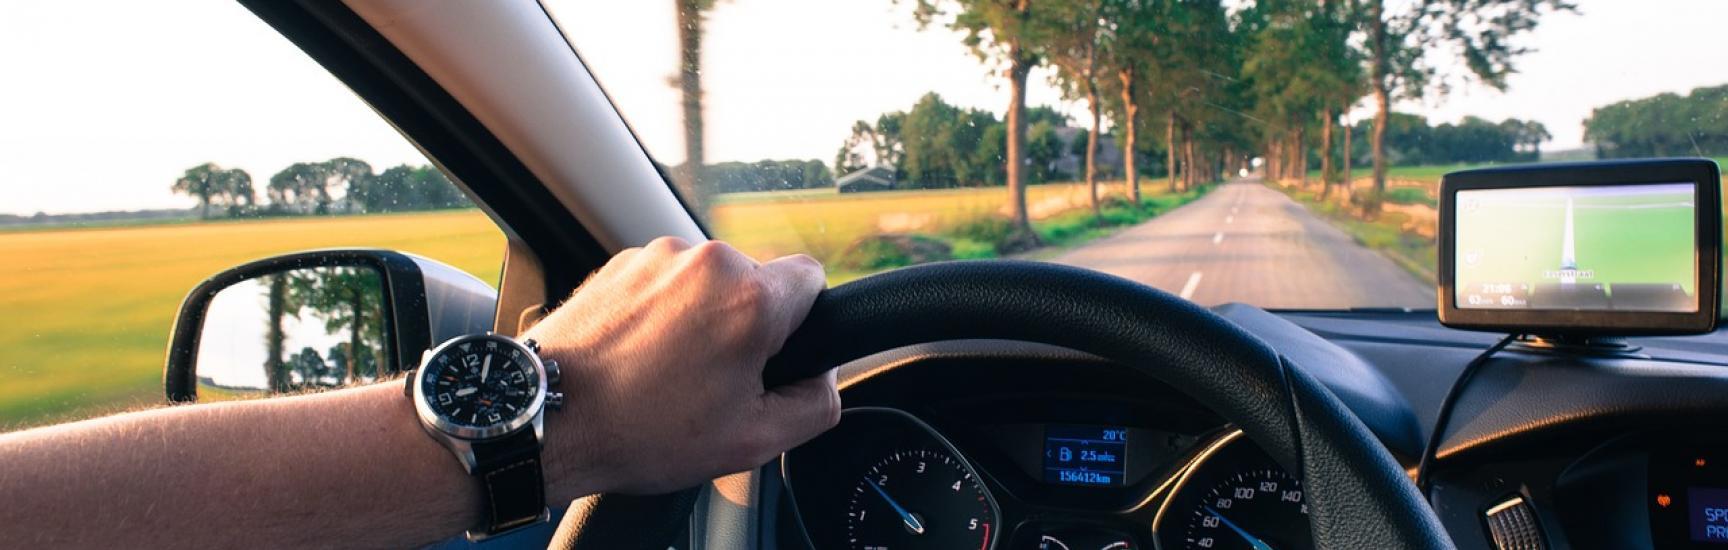 driving high